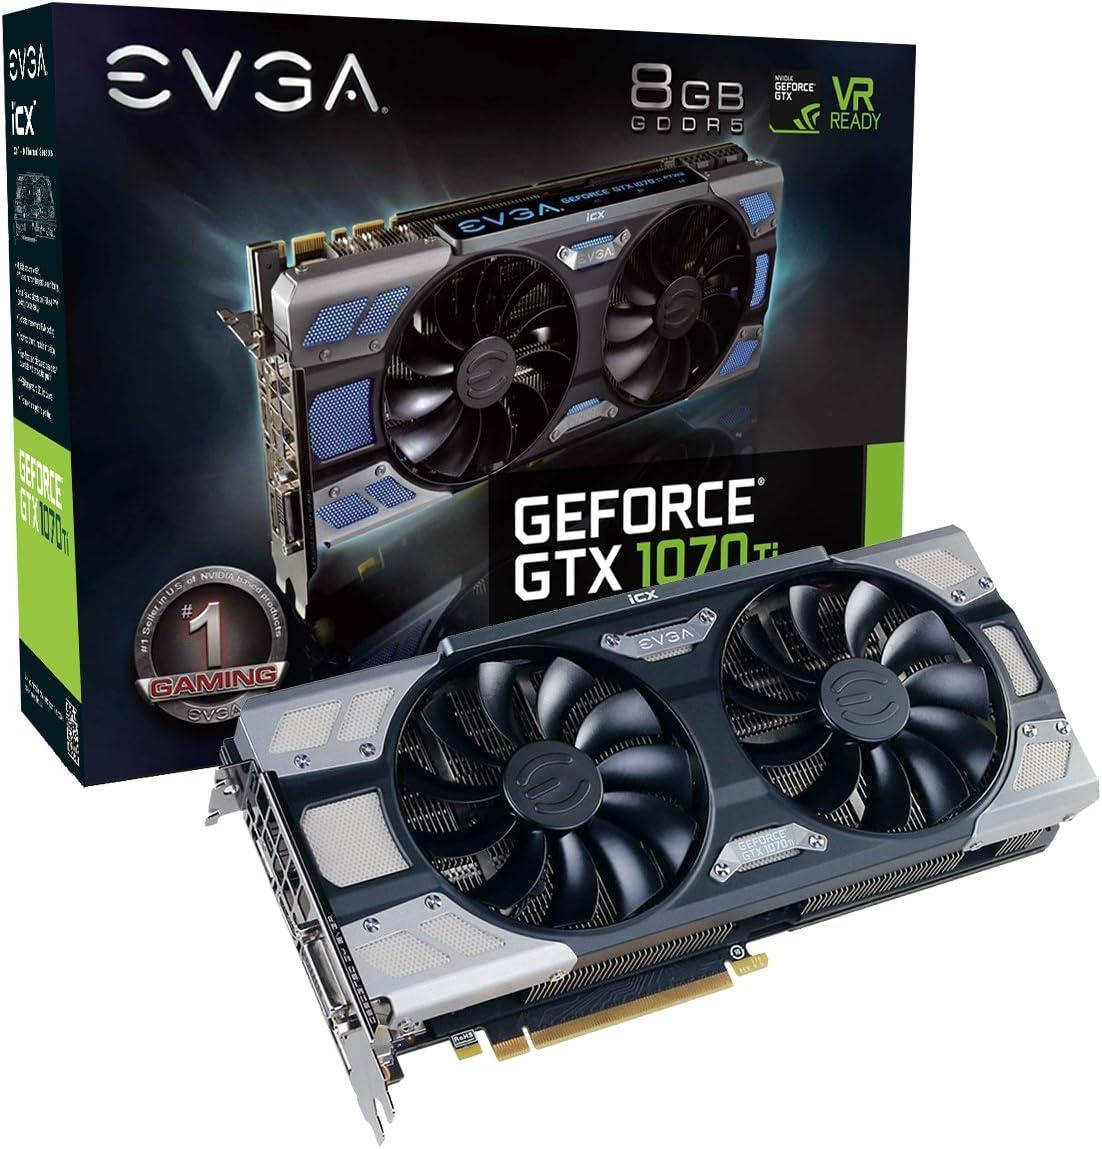 EVGA GeForce GTX 1070 Ti FTW2 GAMING, 8GB GDDR5, iCX Technology - 9 Thermal Sensors & RGB LED G/P/M, Asynch Fan, Optimized Airflow Graphics Card 08G-P4-6775-KR